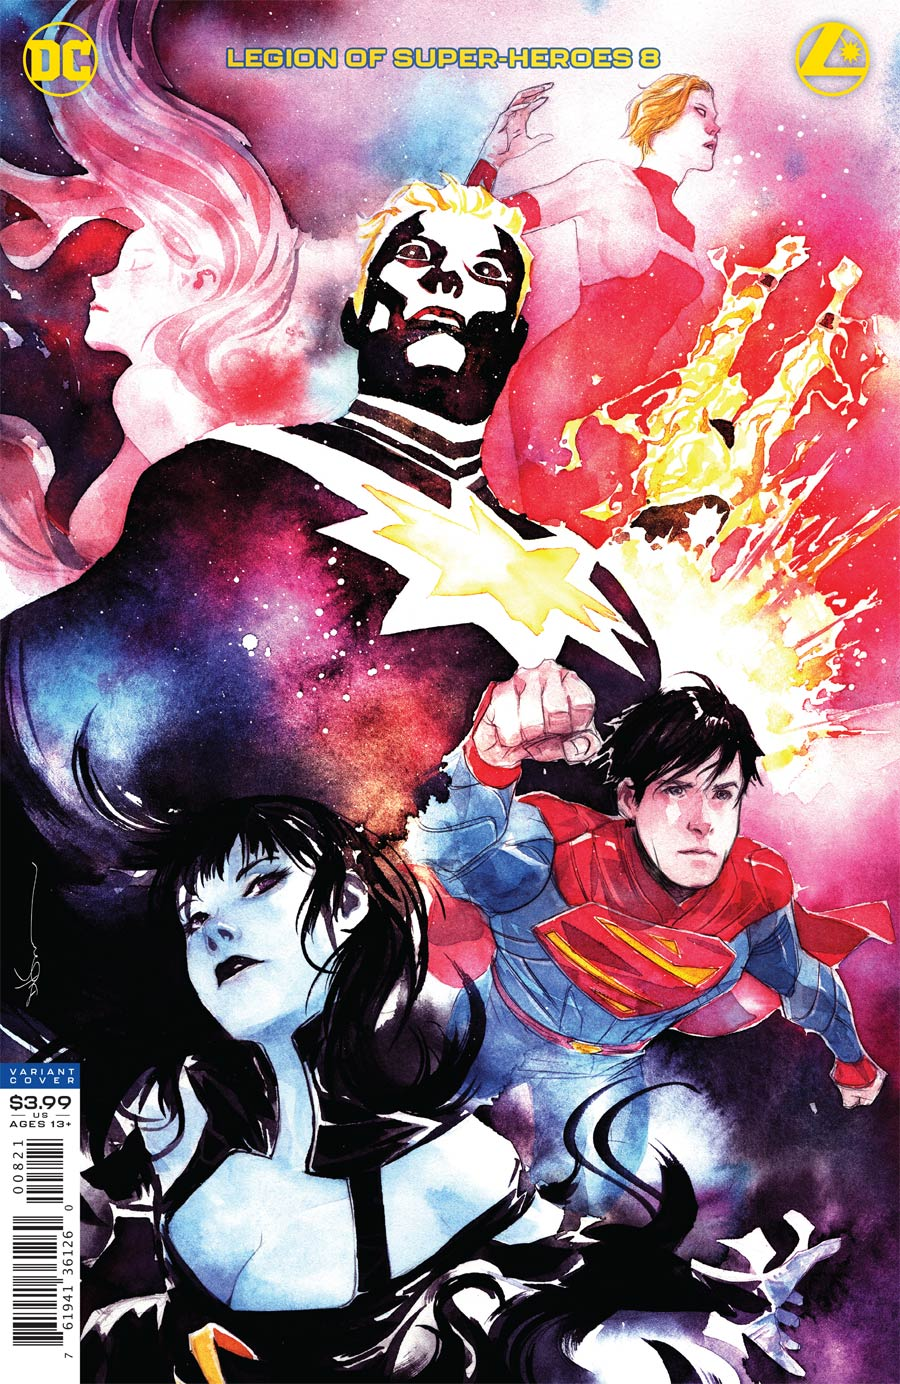 Legion Of Super-Heroes Vol 8 #8 Cover B Variant Dustin Nguyen Cover